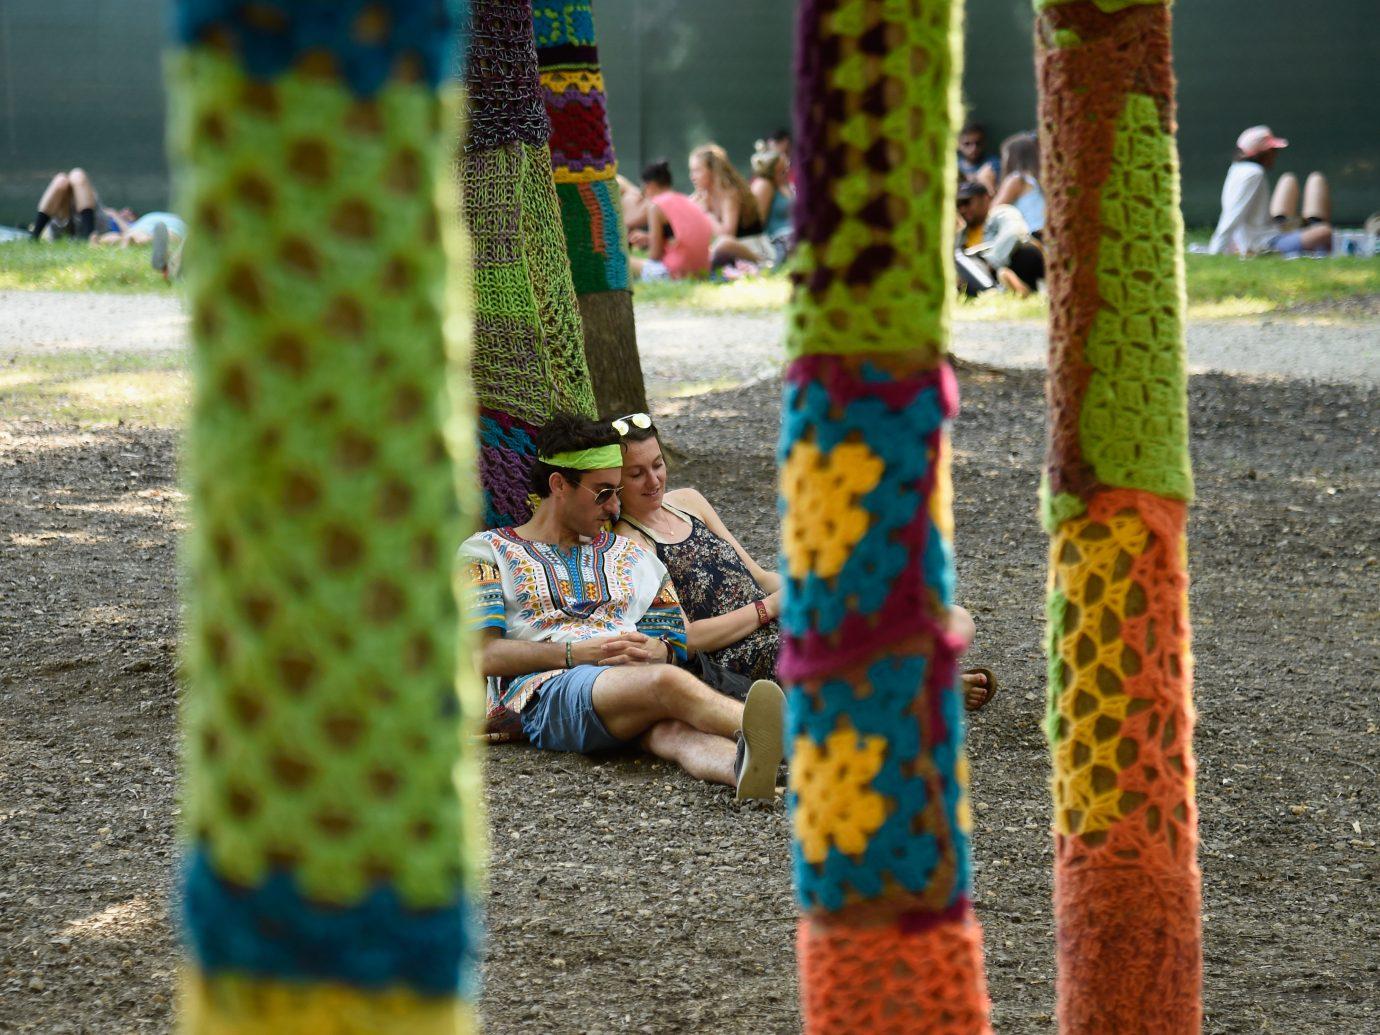 Festivalgoers relax during the 2018 Firefly Music Festival